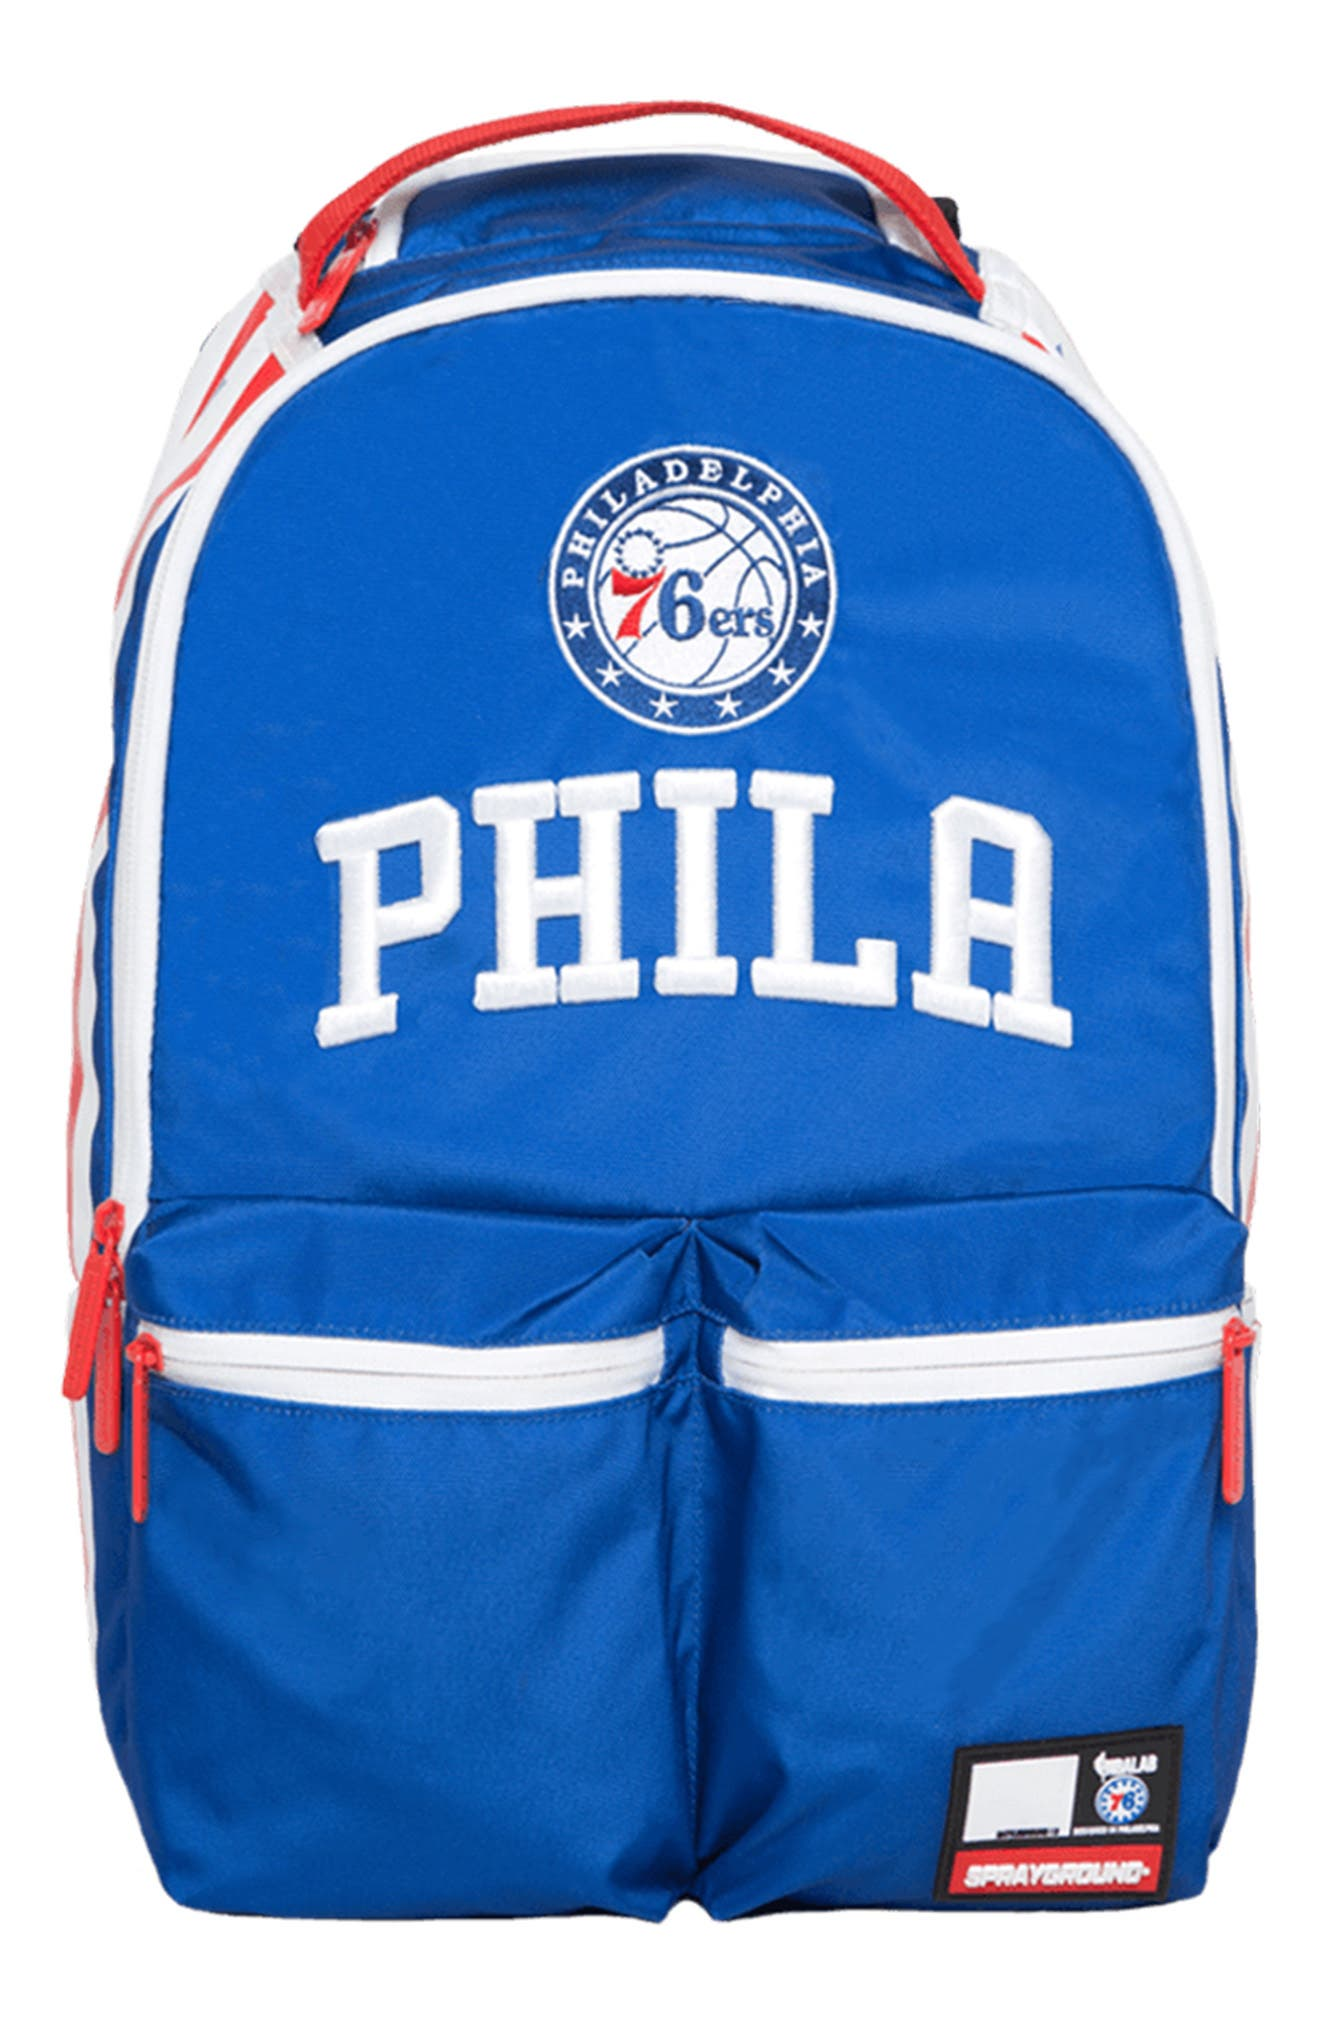 SPRAYGROUND Philadelphia '76Ers Double Cargo Backpack - Blue